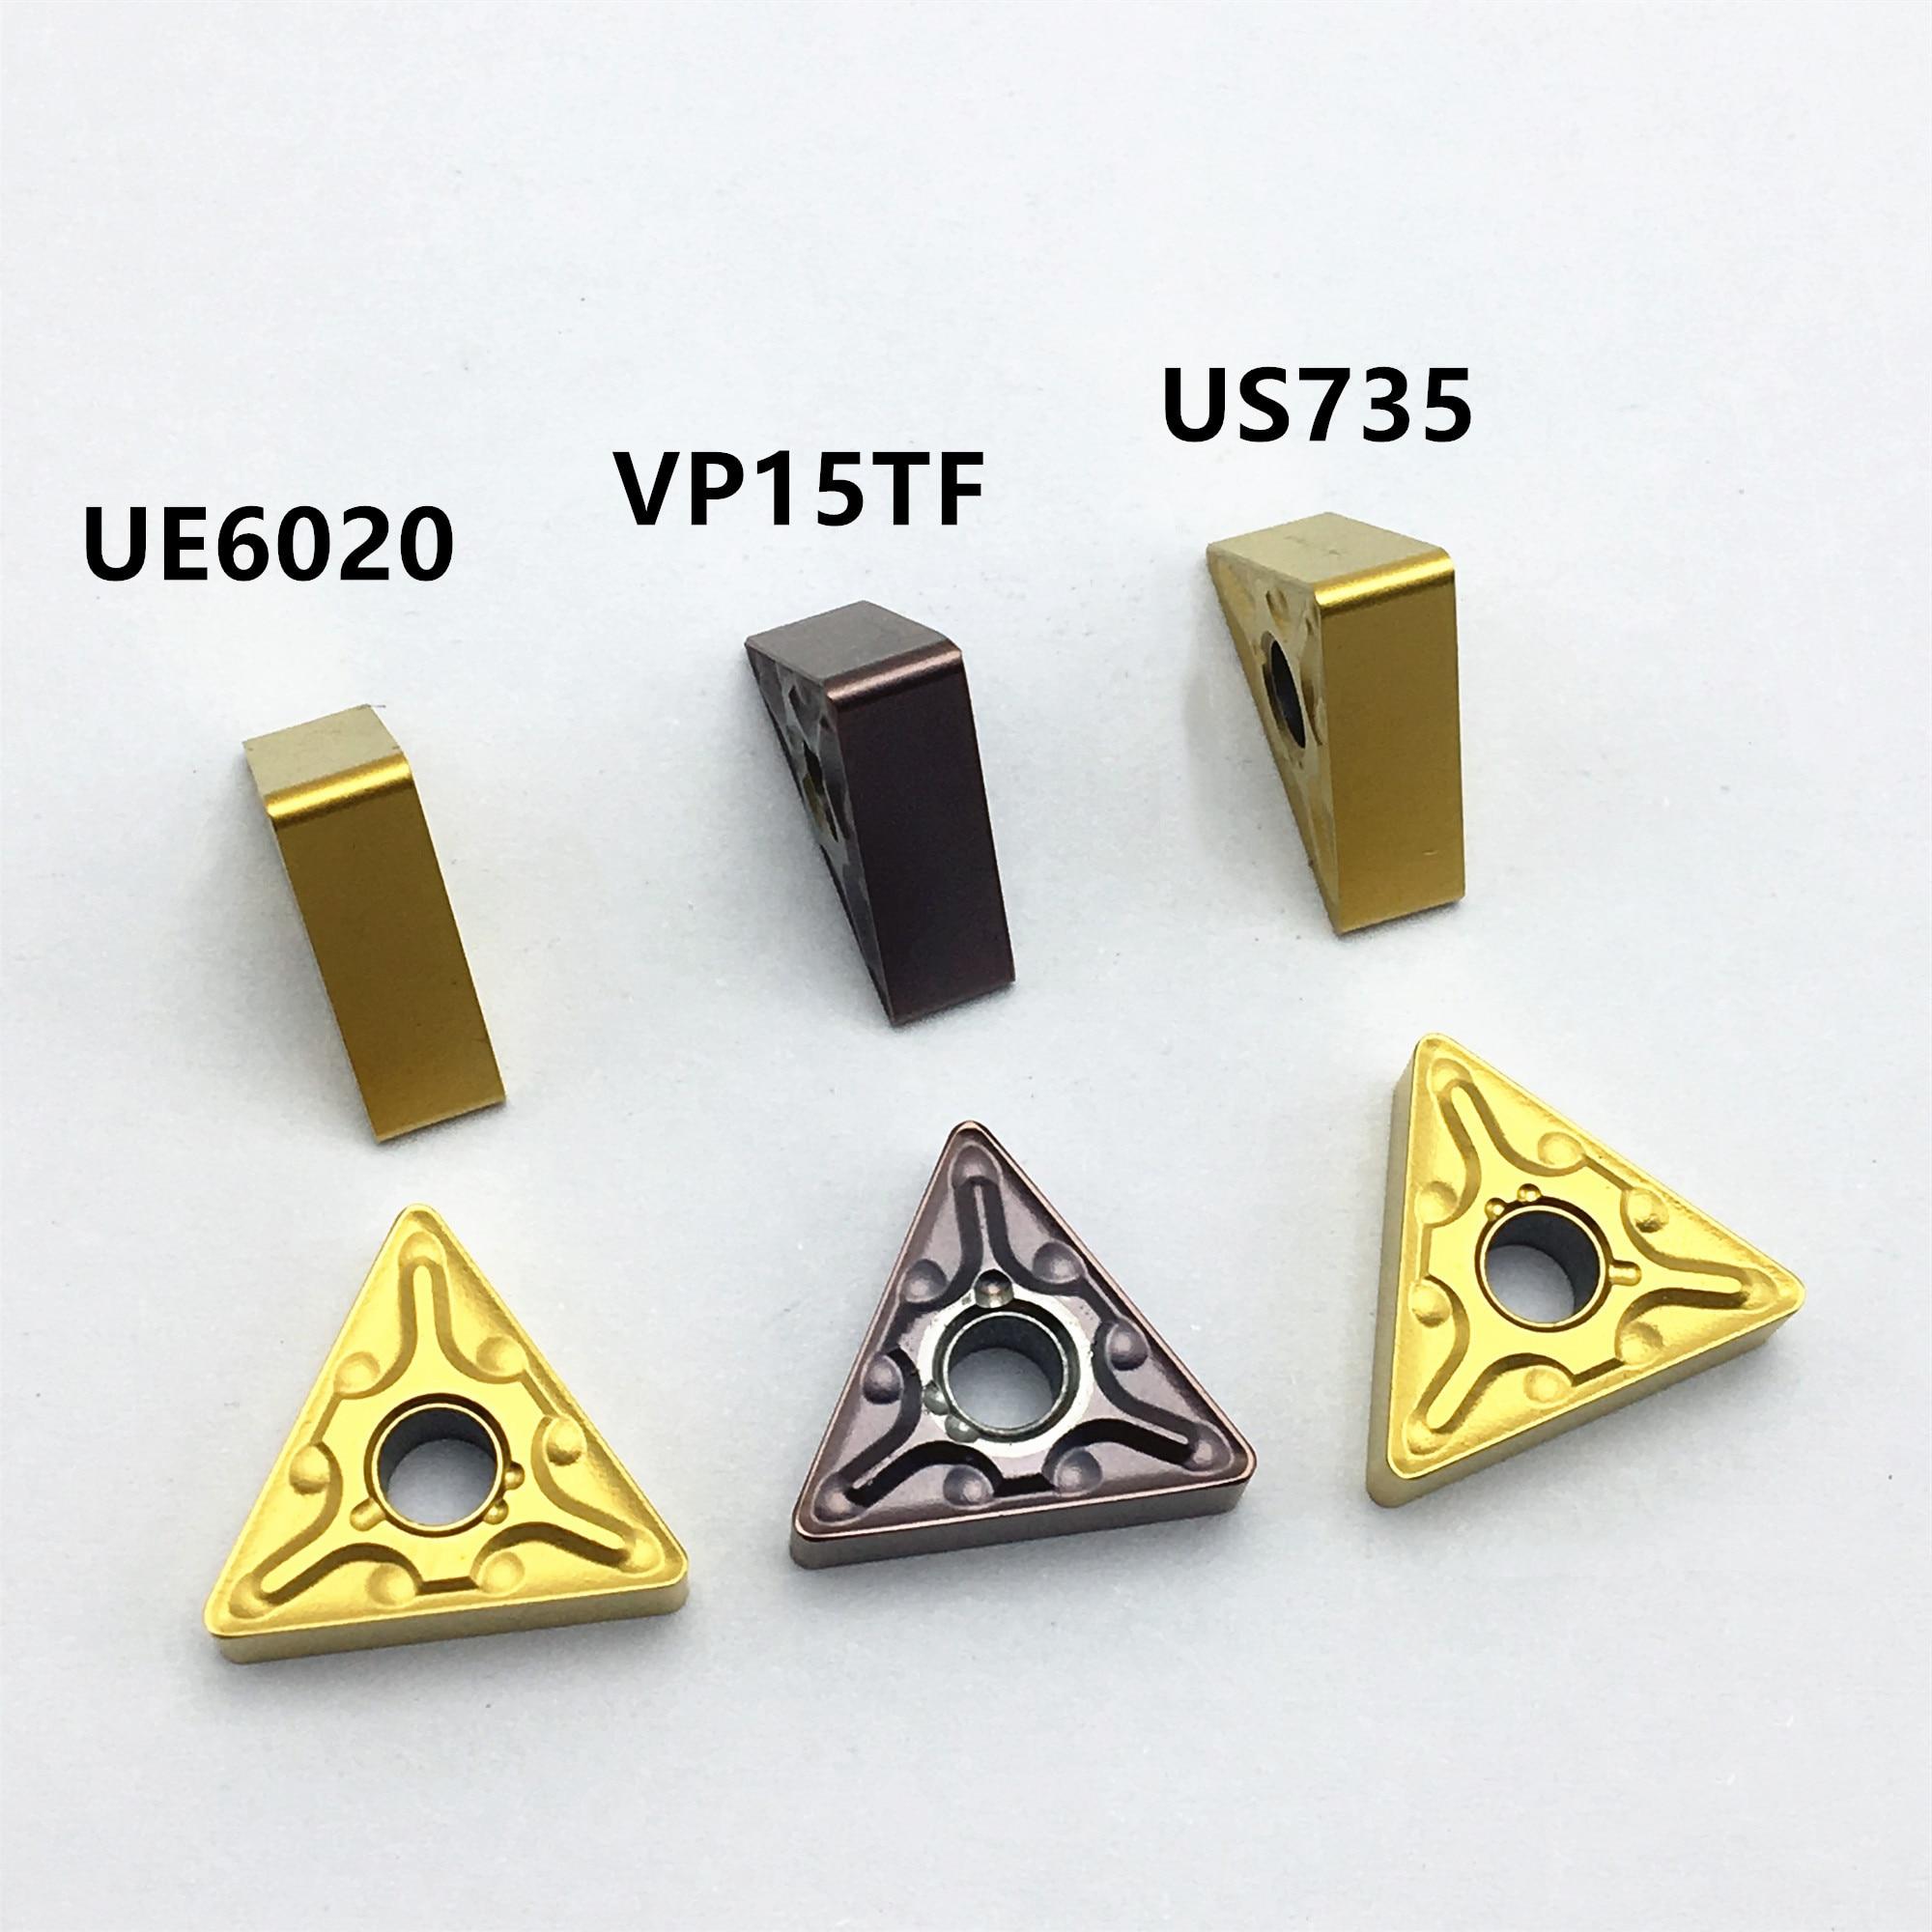 TNMG160404 MA UE6020/VP15TF/US735 TNMG160408 MA UE6020 US735 VP15TF Carbide Insert Lathe Tool Turning Tool CNC Tool Tnmg